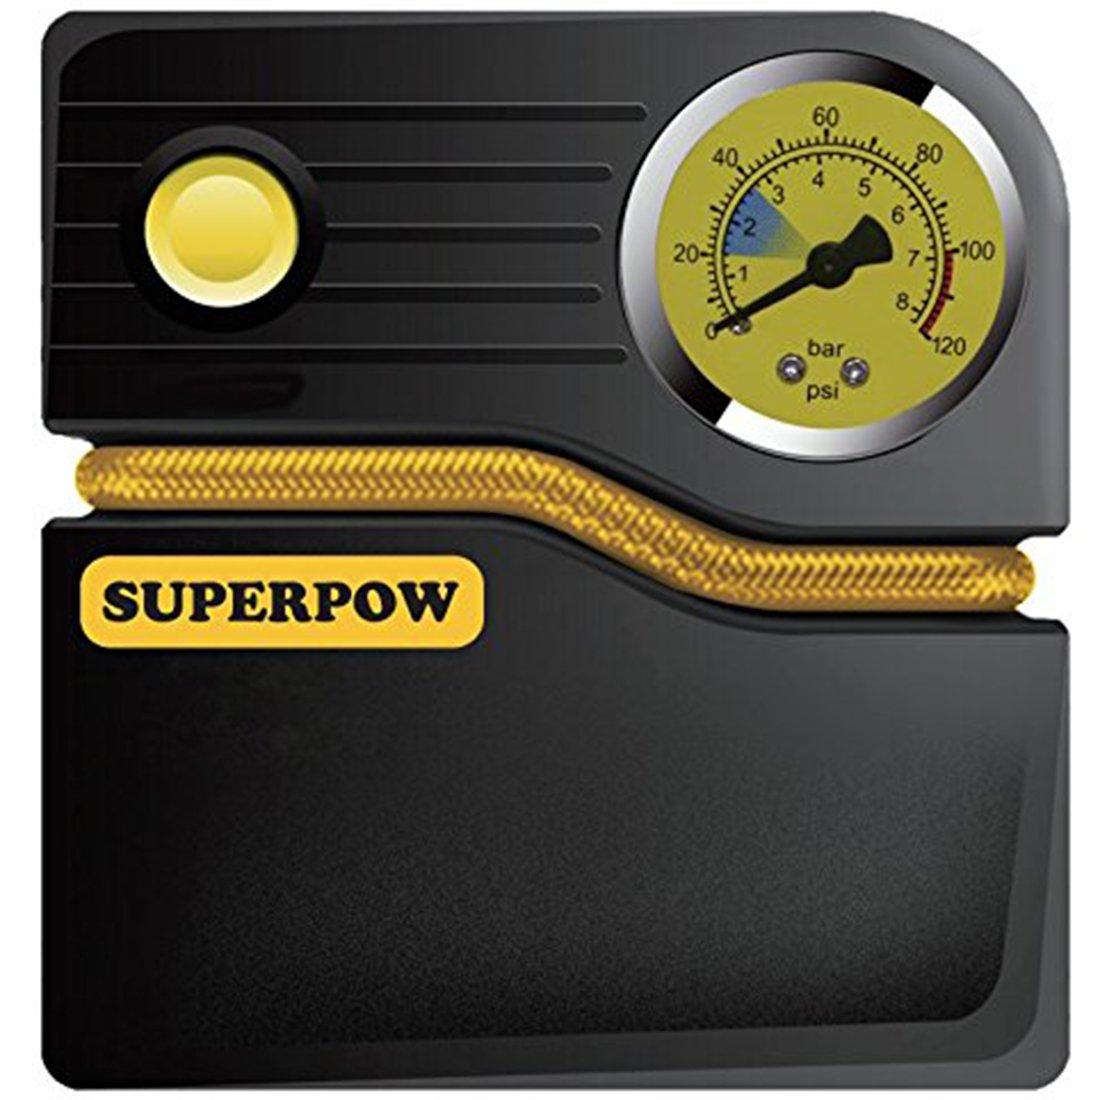 SUPERPOW Compresor de Aire Portátil Bomba Inflador de V PSI Metros Cable